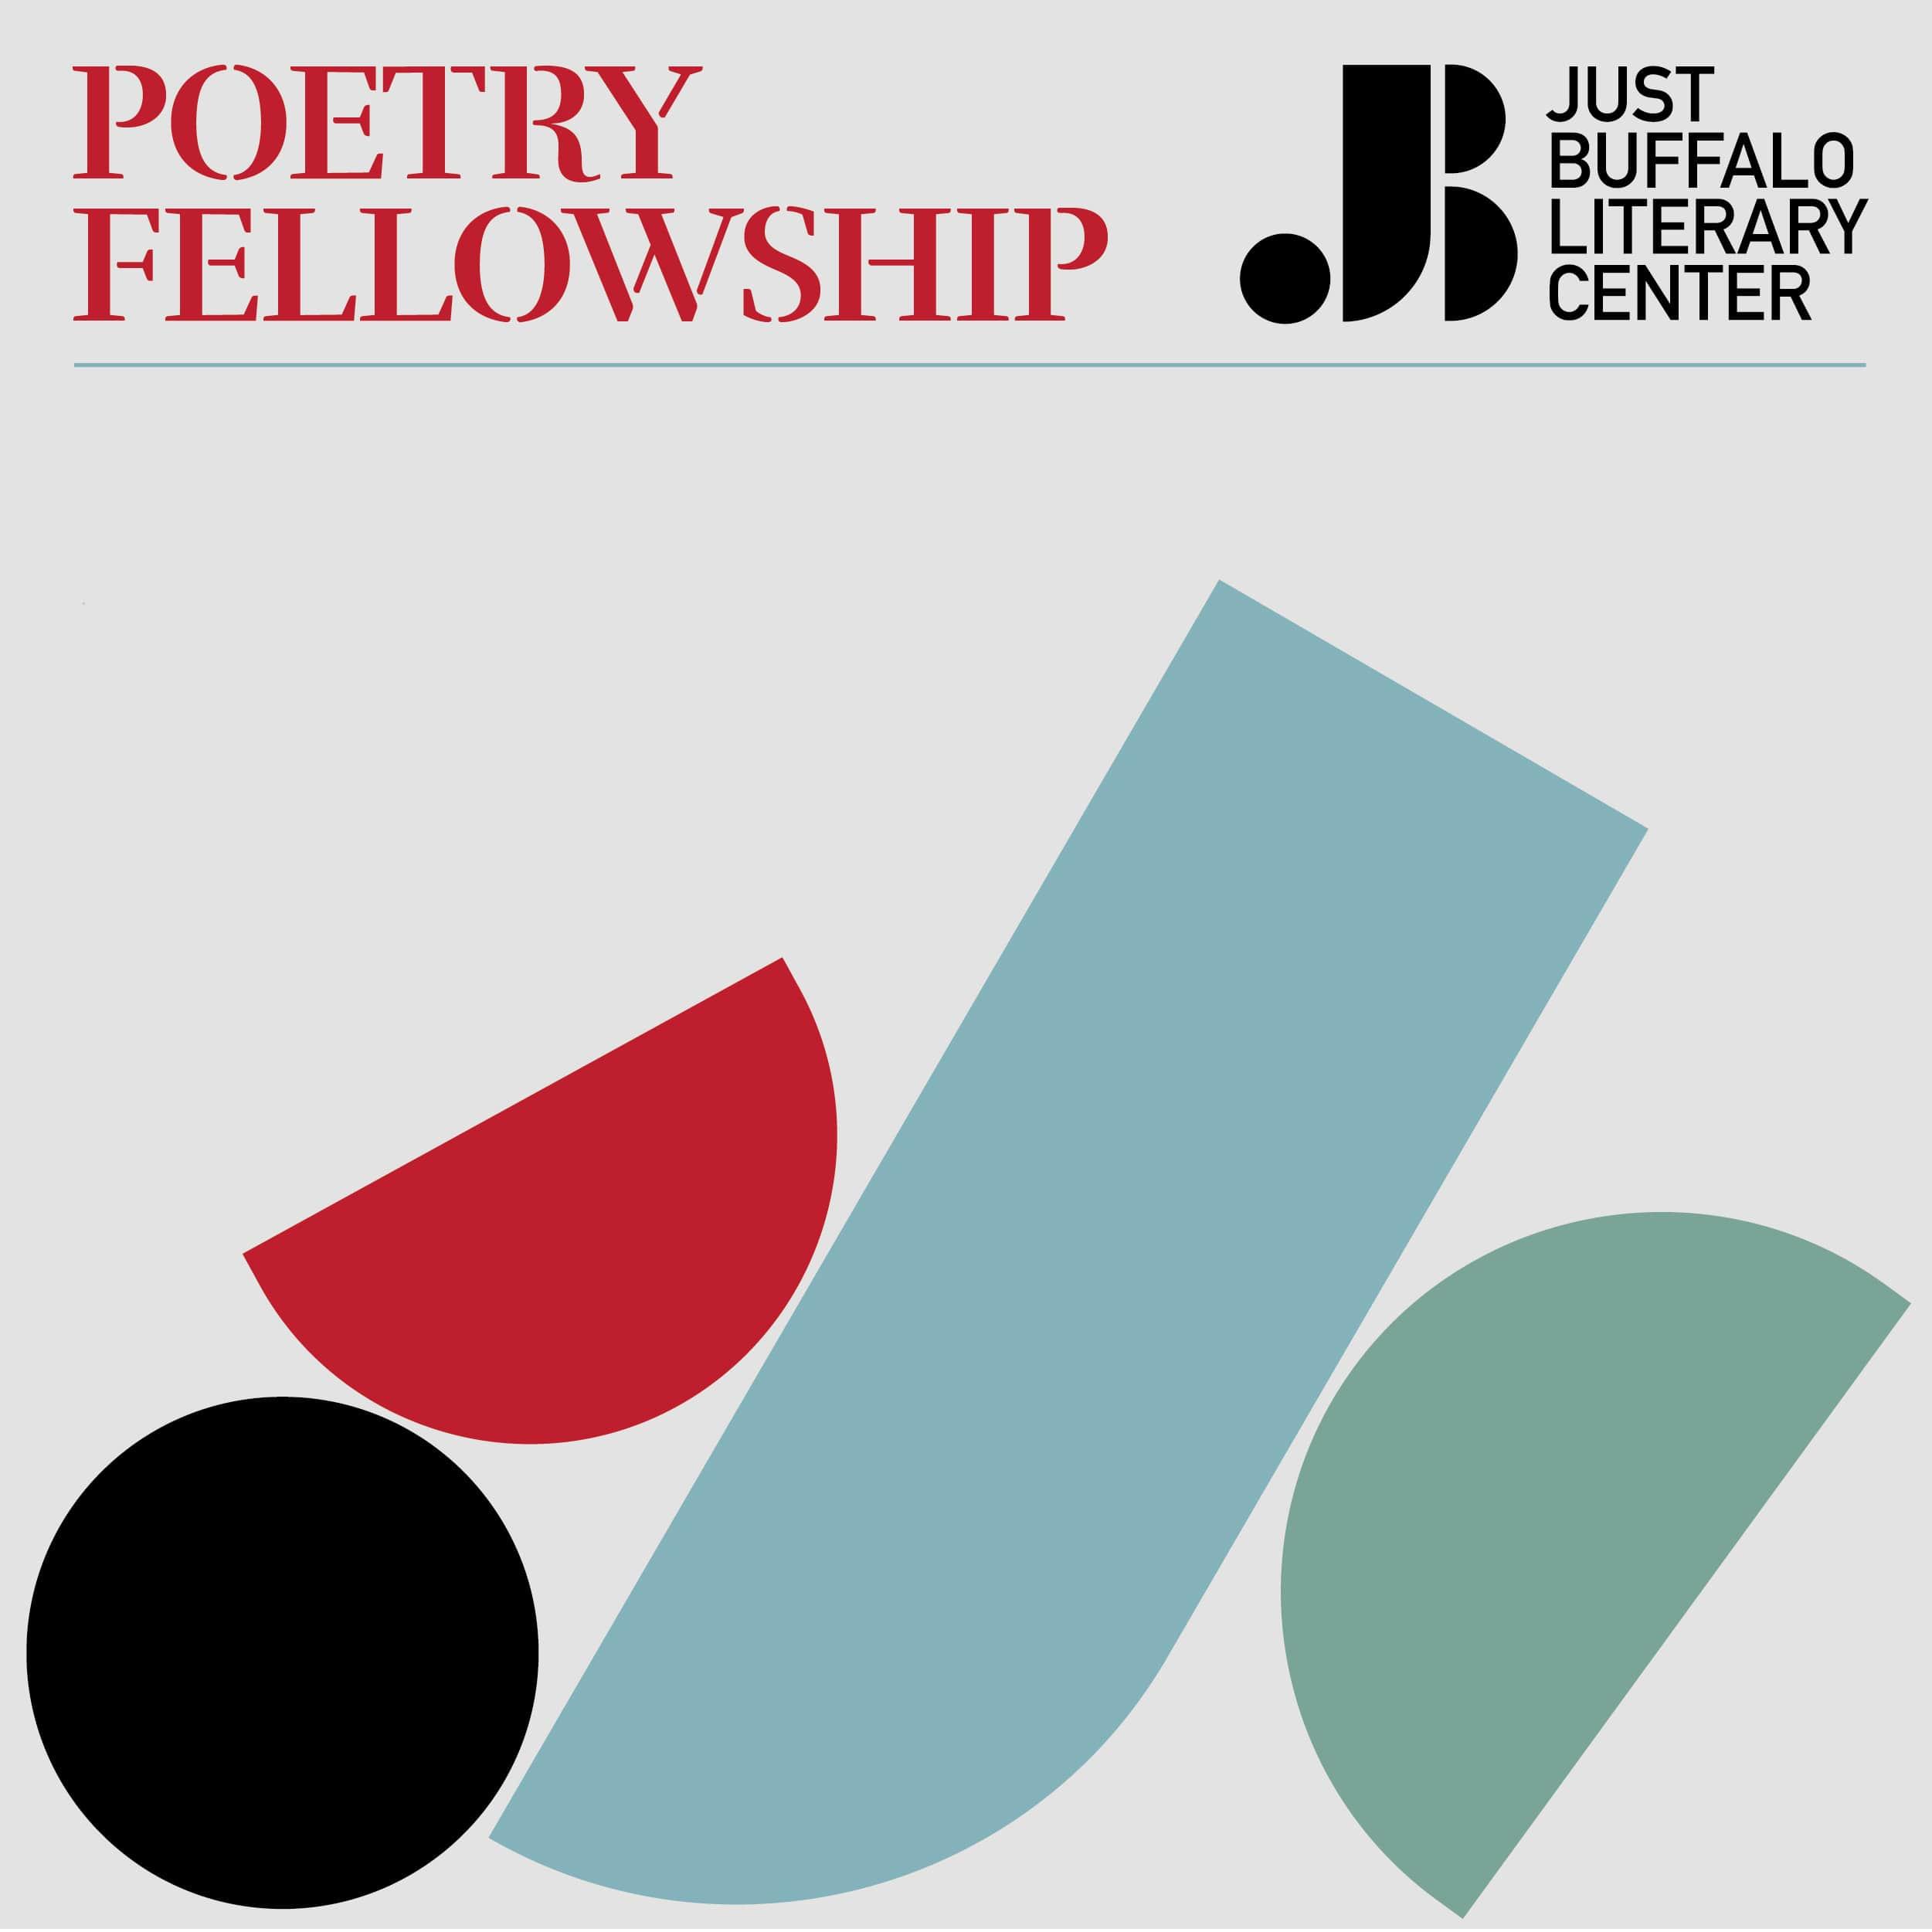 Poetry Fellowship